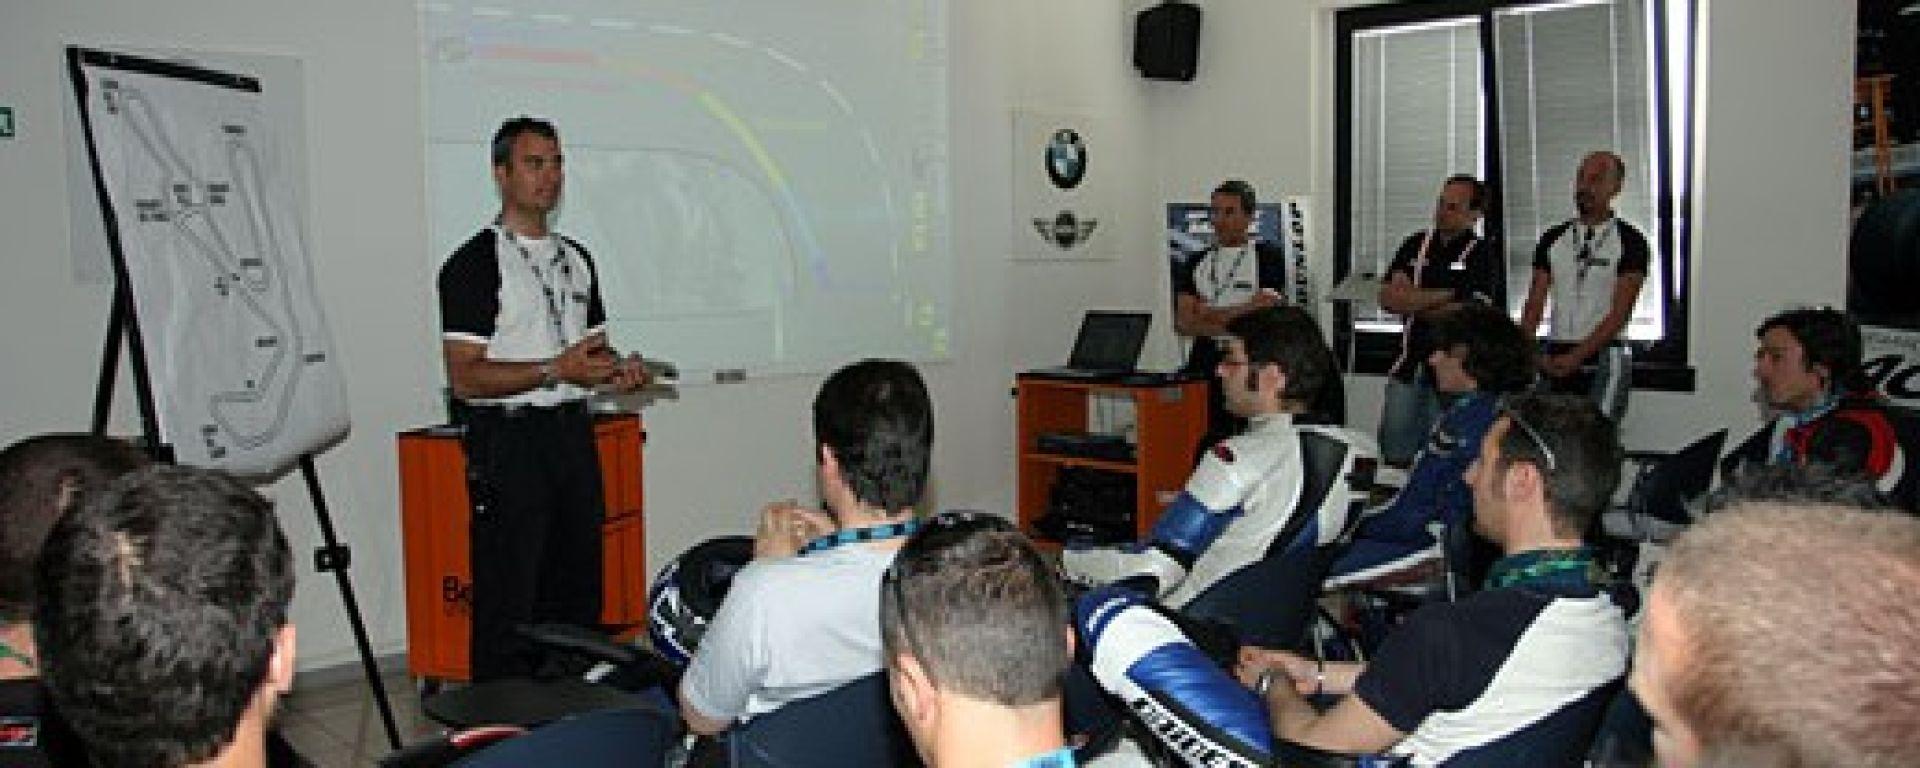 GuidarePilotare: i corsi moto 2006